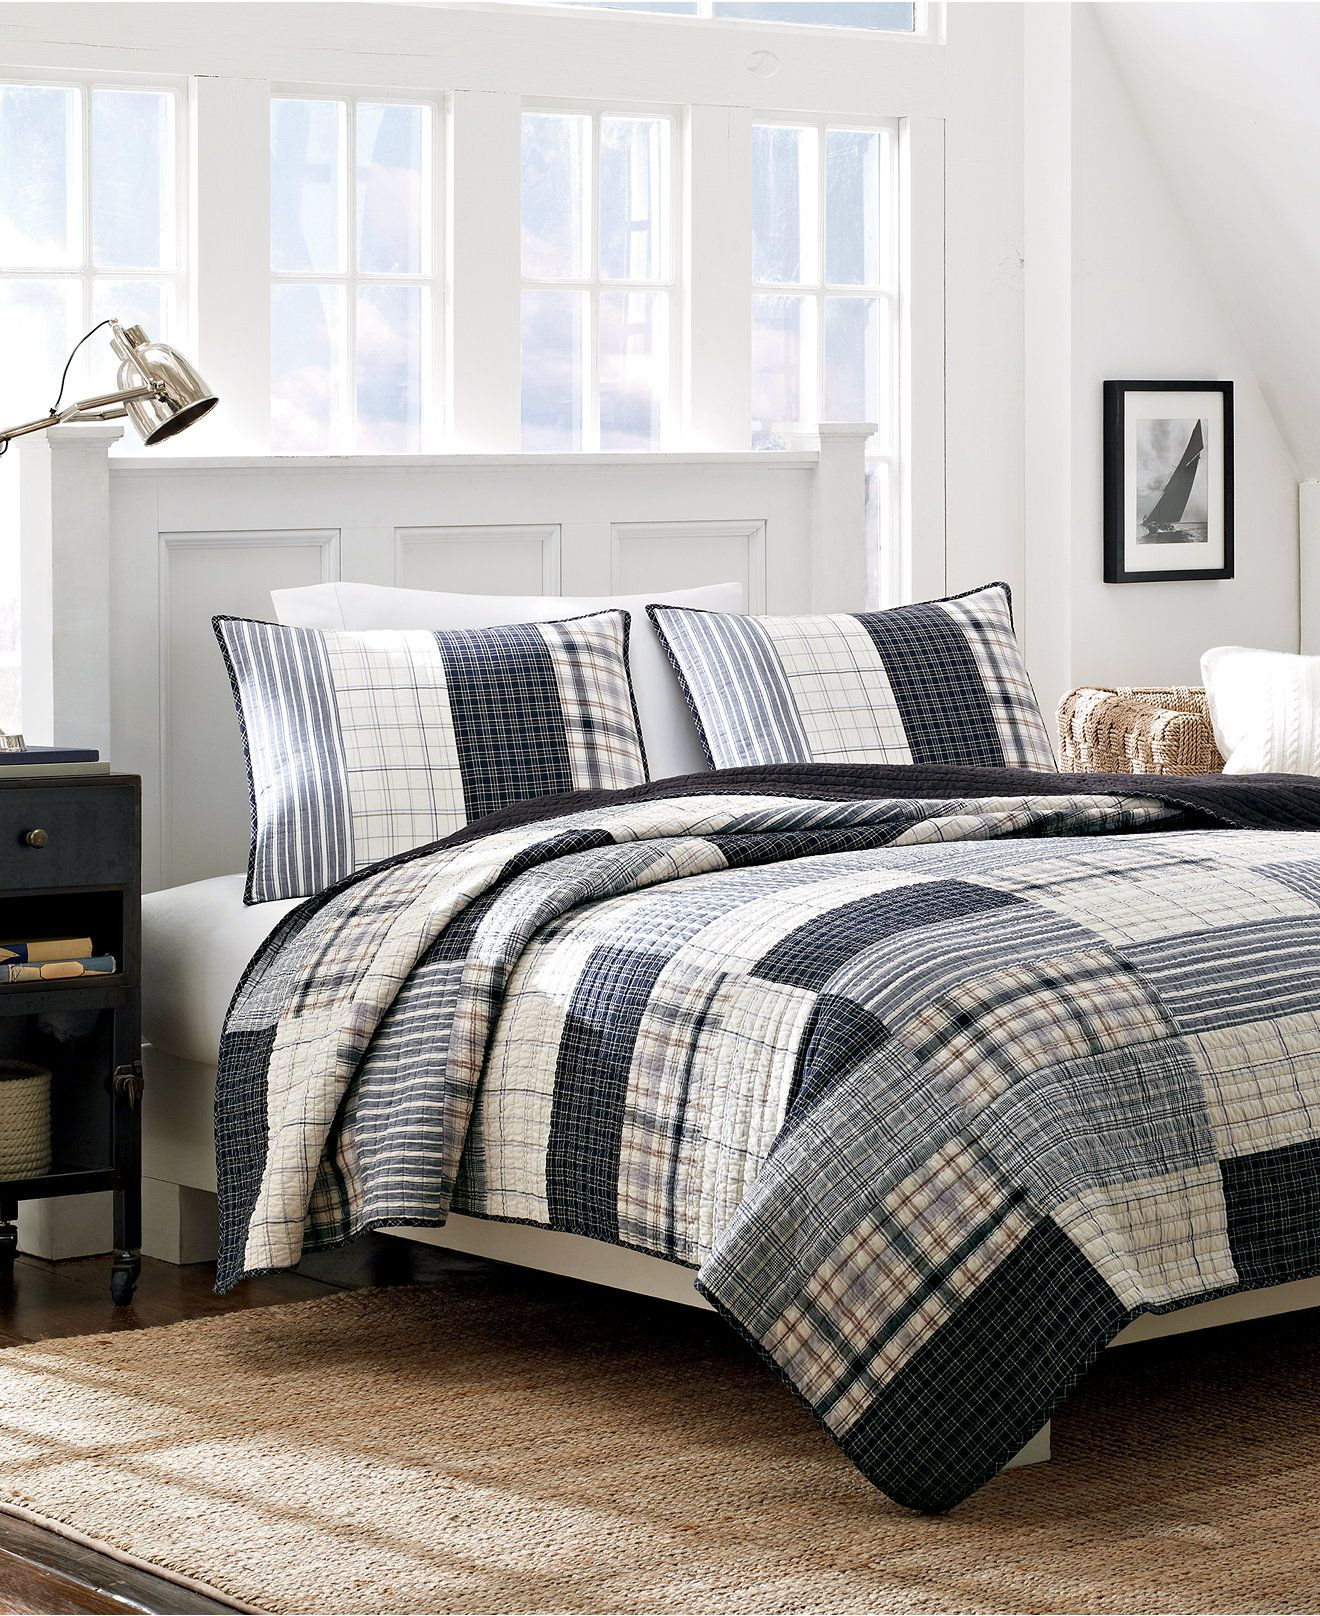 Closeout Nautica Longview Quilt Collection Reviews Quilts Bedspreads Bed Bath Macy S Quilt Comforter Reversible Quilt King Quilt